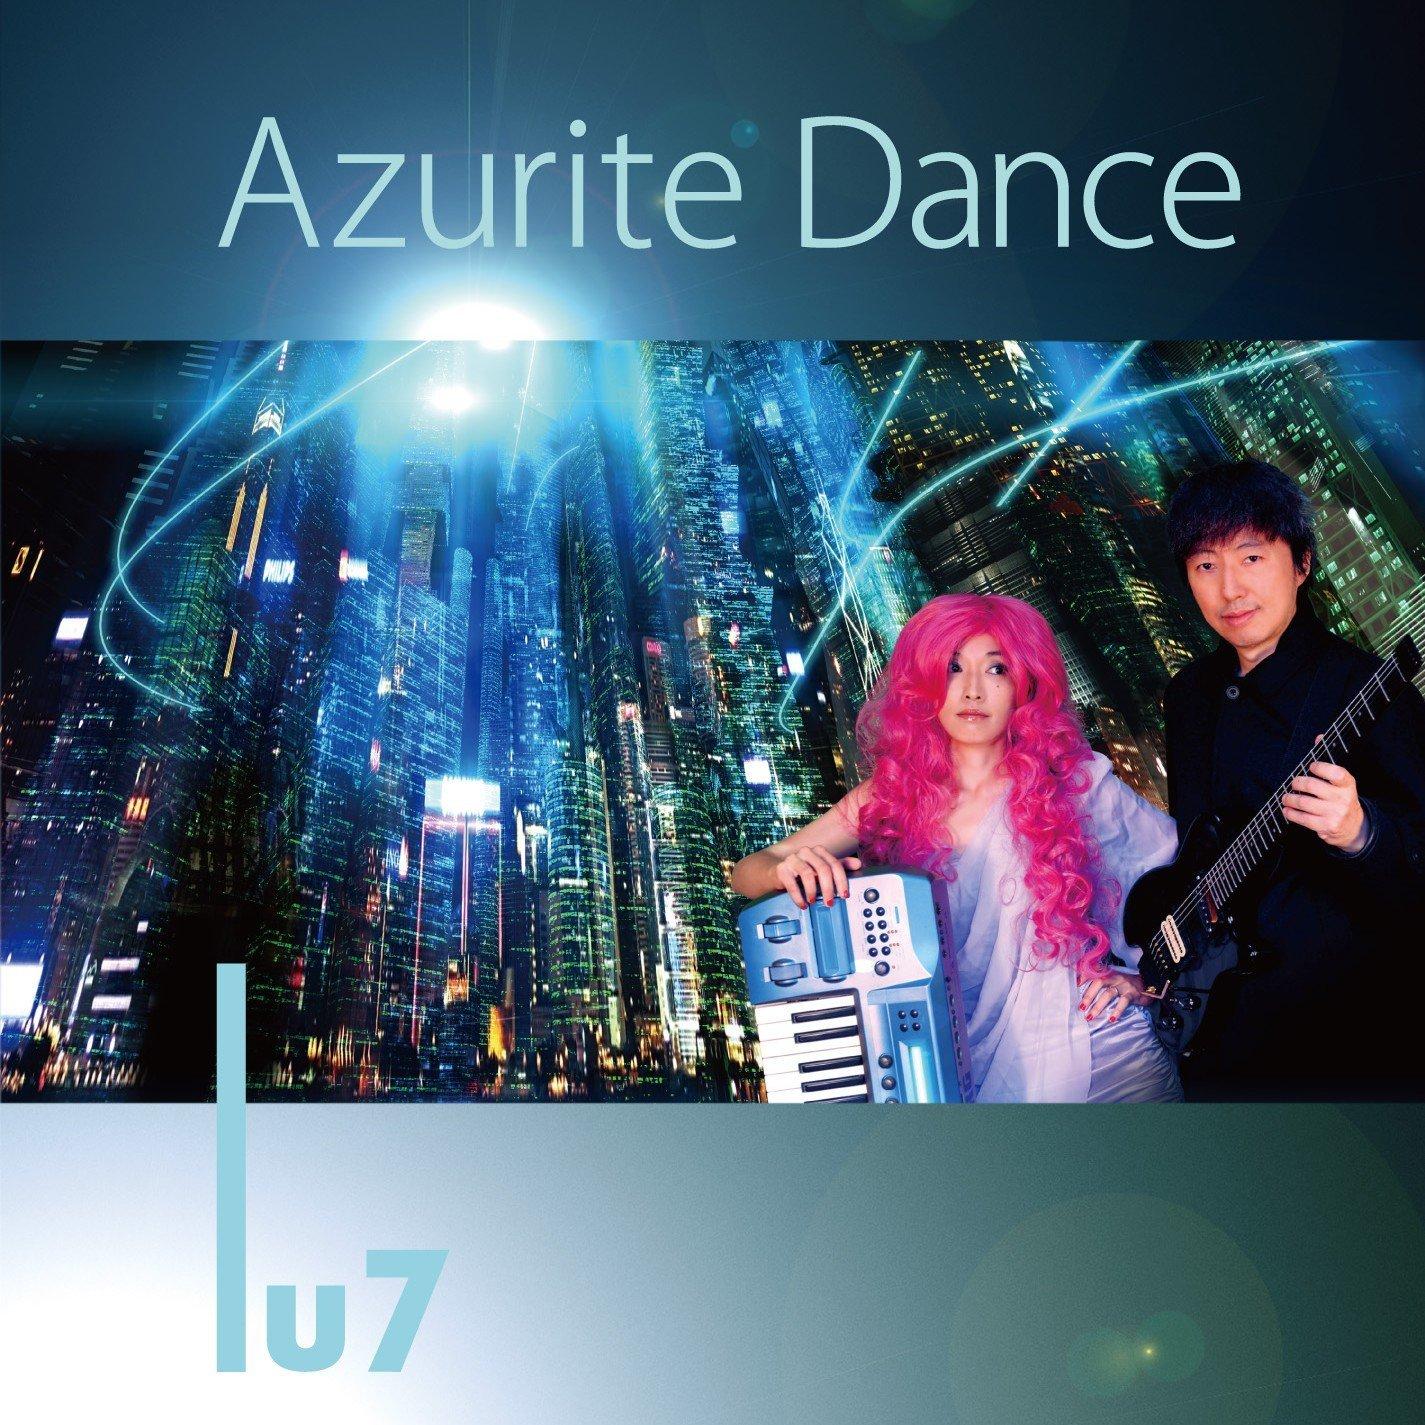 Lu7 Azurite Dance